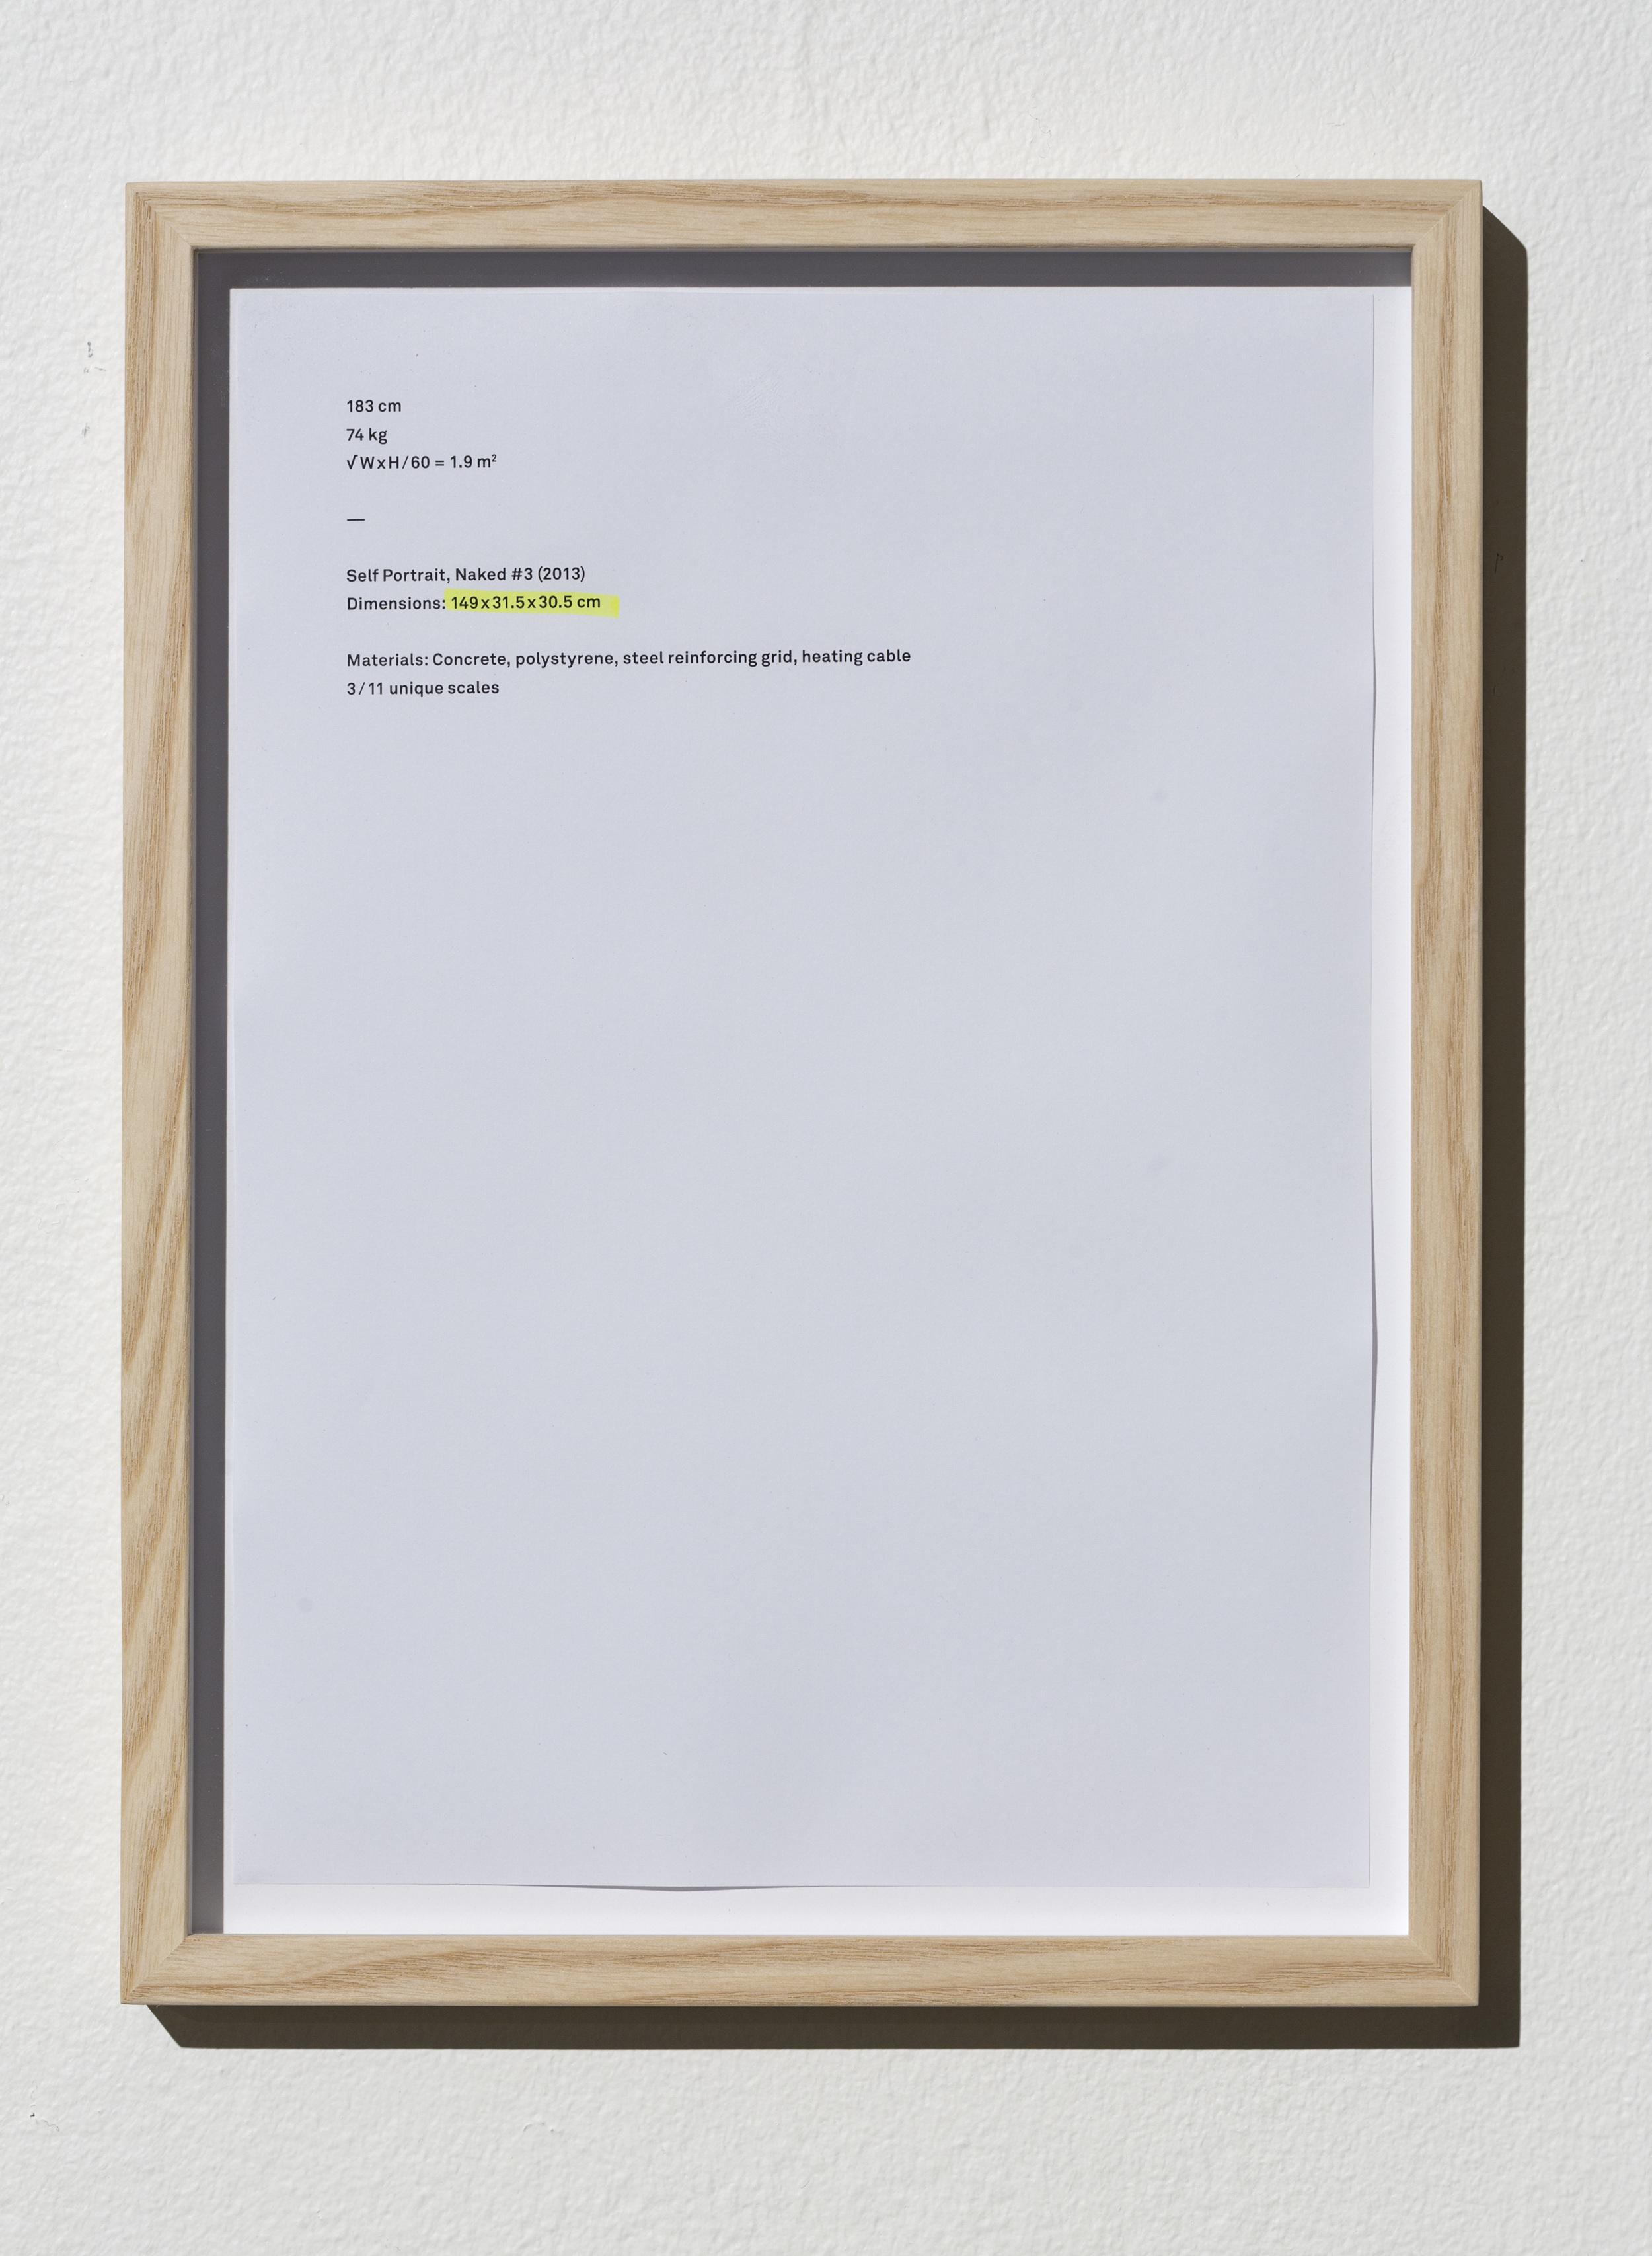 SELF-PORTRAIT, NAKED (Certificats) Dimensions: 29x21 cm (framed print) Materials: Glass, prints, wood.